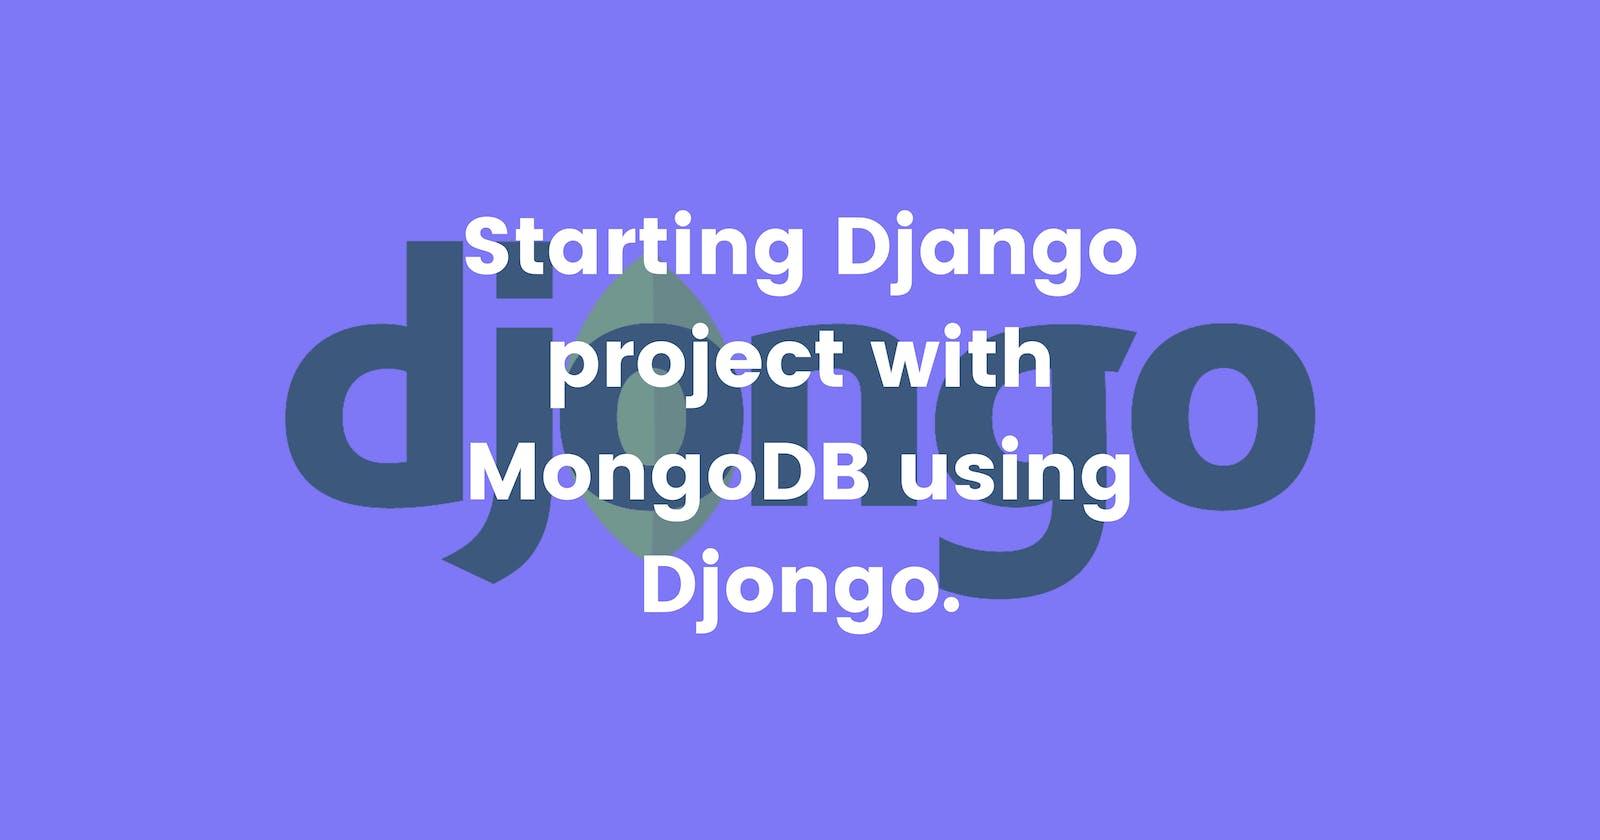 Starting Django project with MongoDB using Djongo.